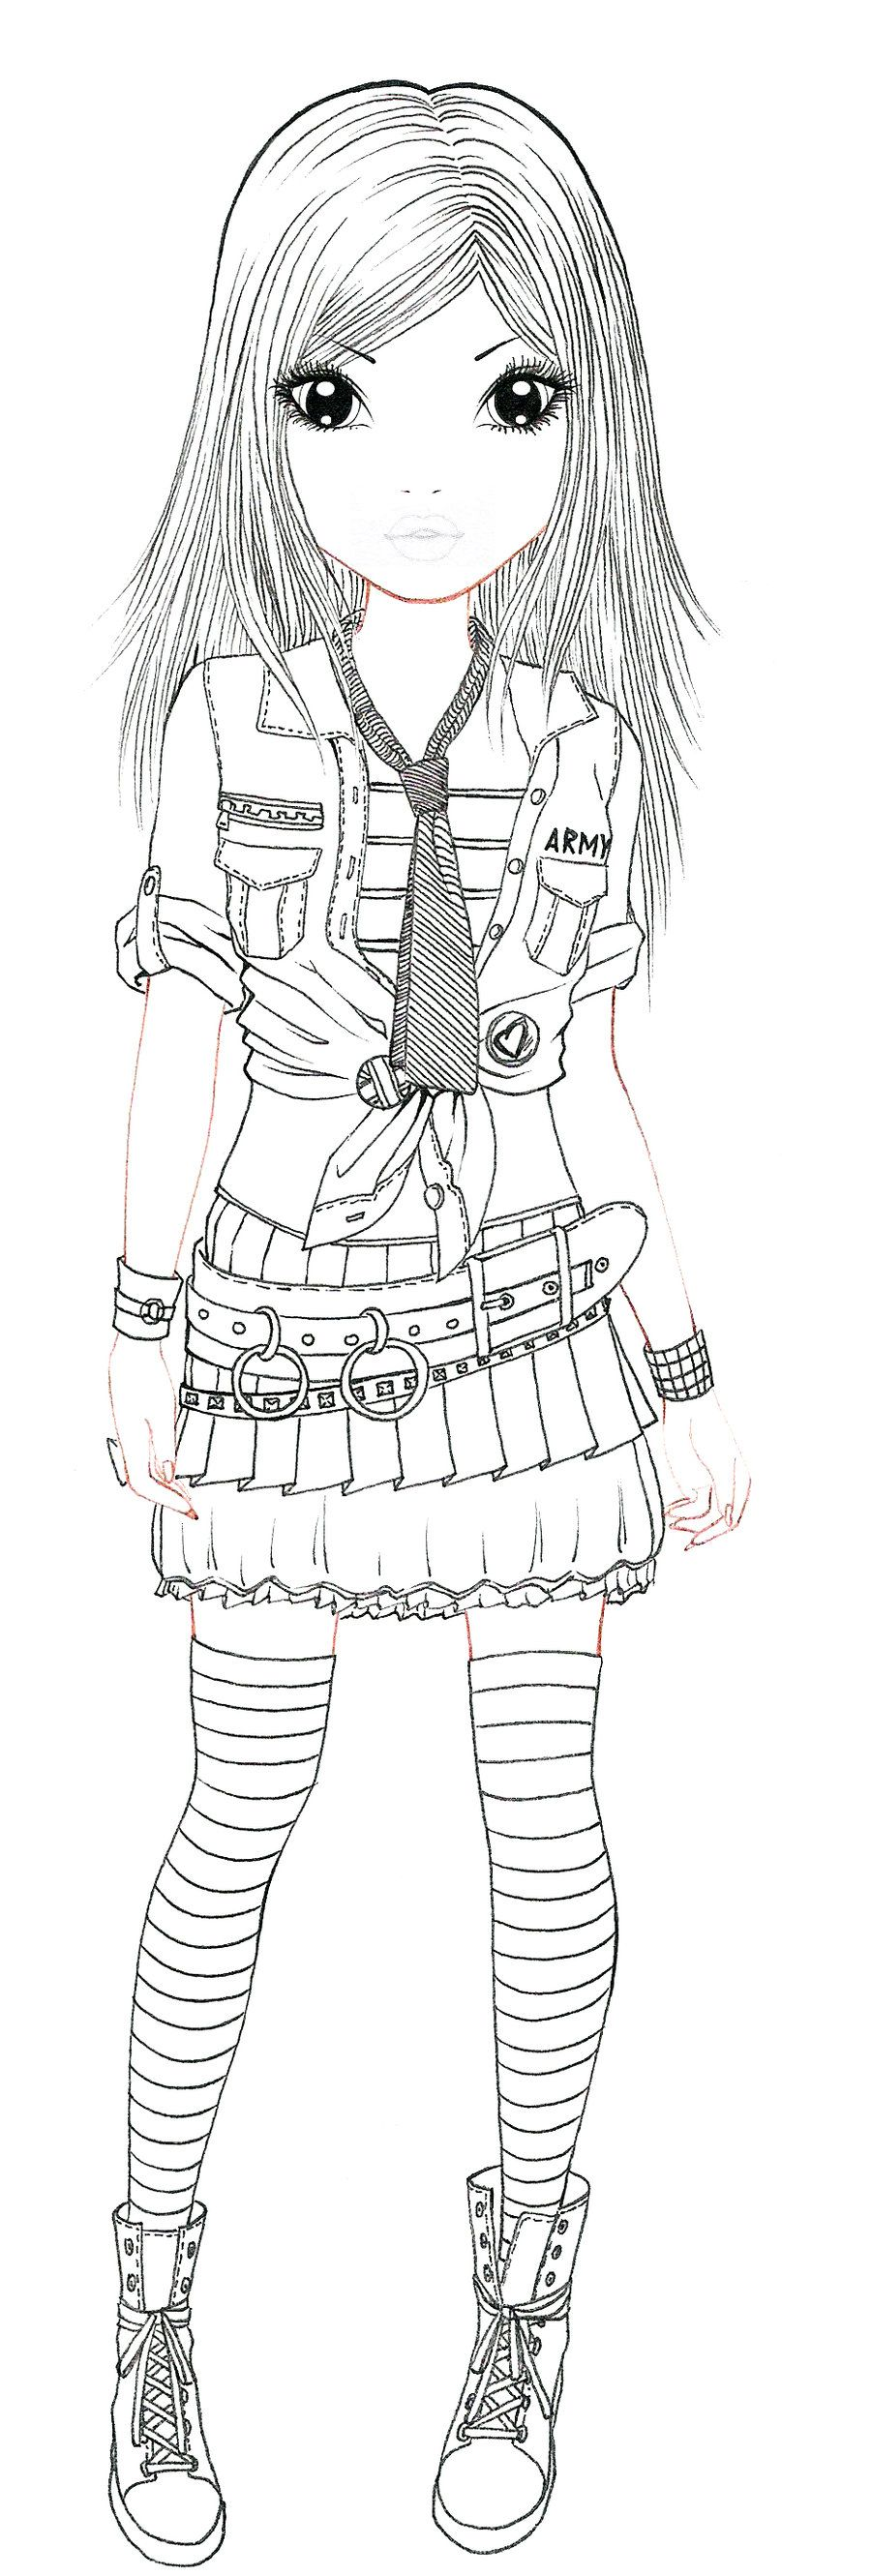 Army lineart by aya ichigo 900 2662 - Dessin top model a imprimer ...